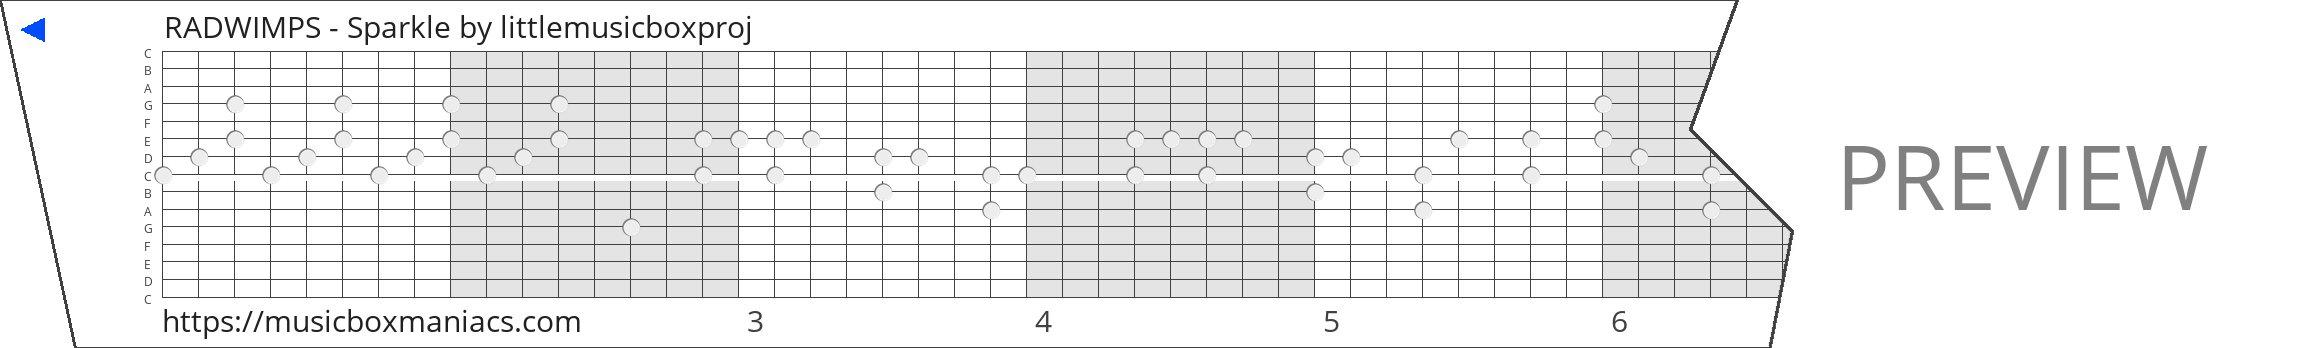 RADWIMPS - Sparkle 15 note music box paper strip